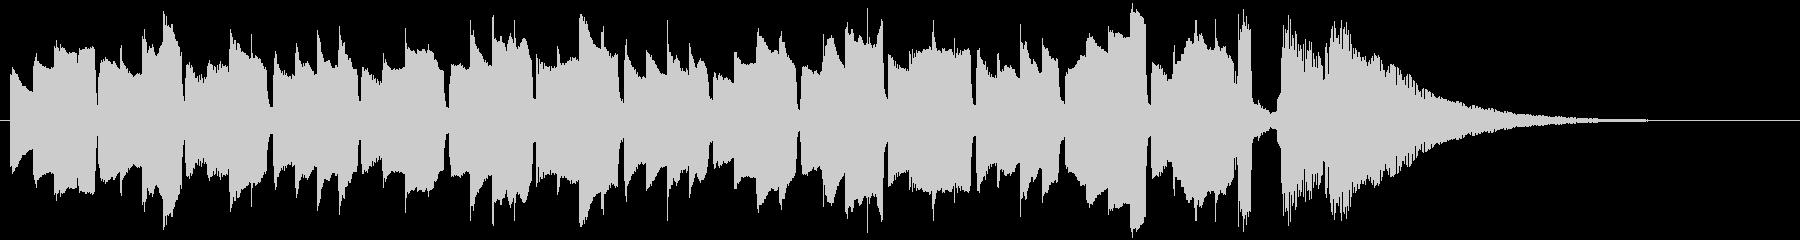 Akogi's gentle simple arpeggio's unreproduced waveform